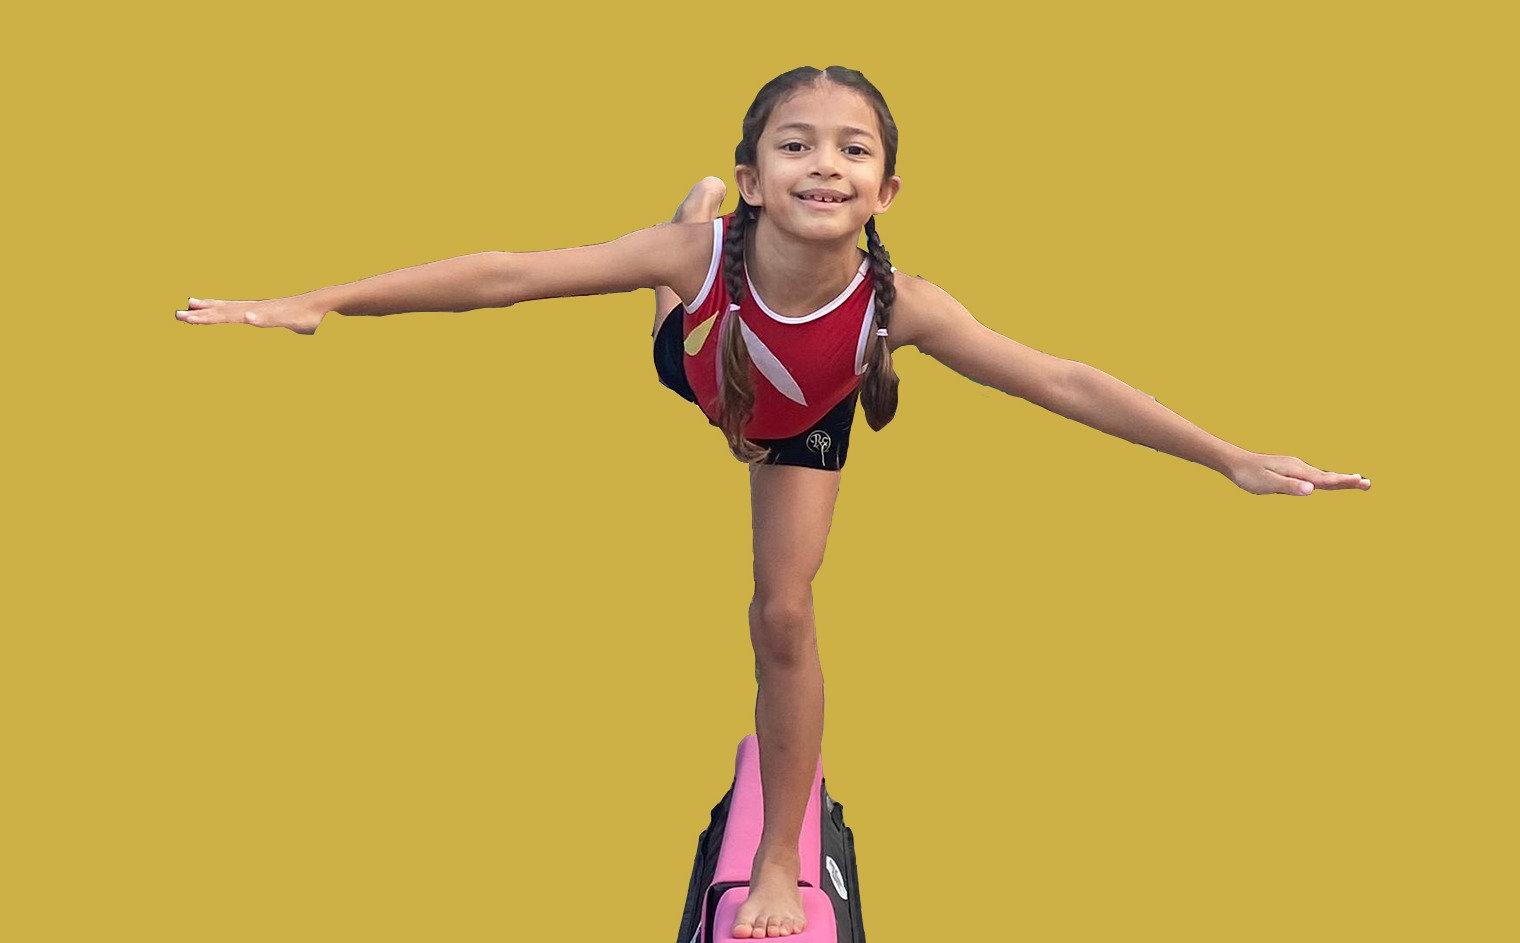 Gymnastics Camp Session 1 (Age 6-9)